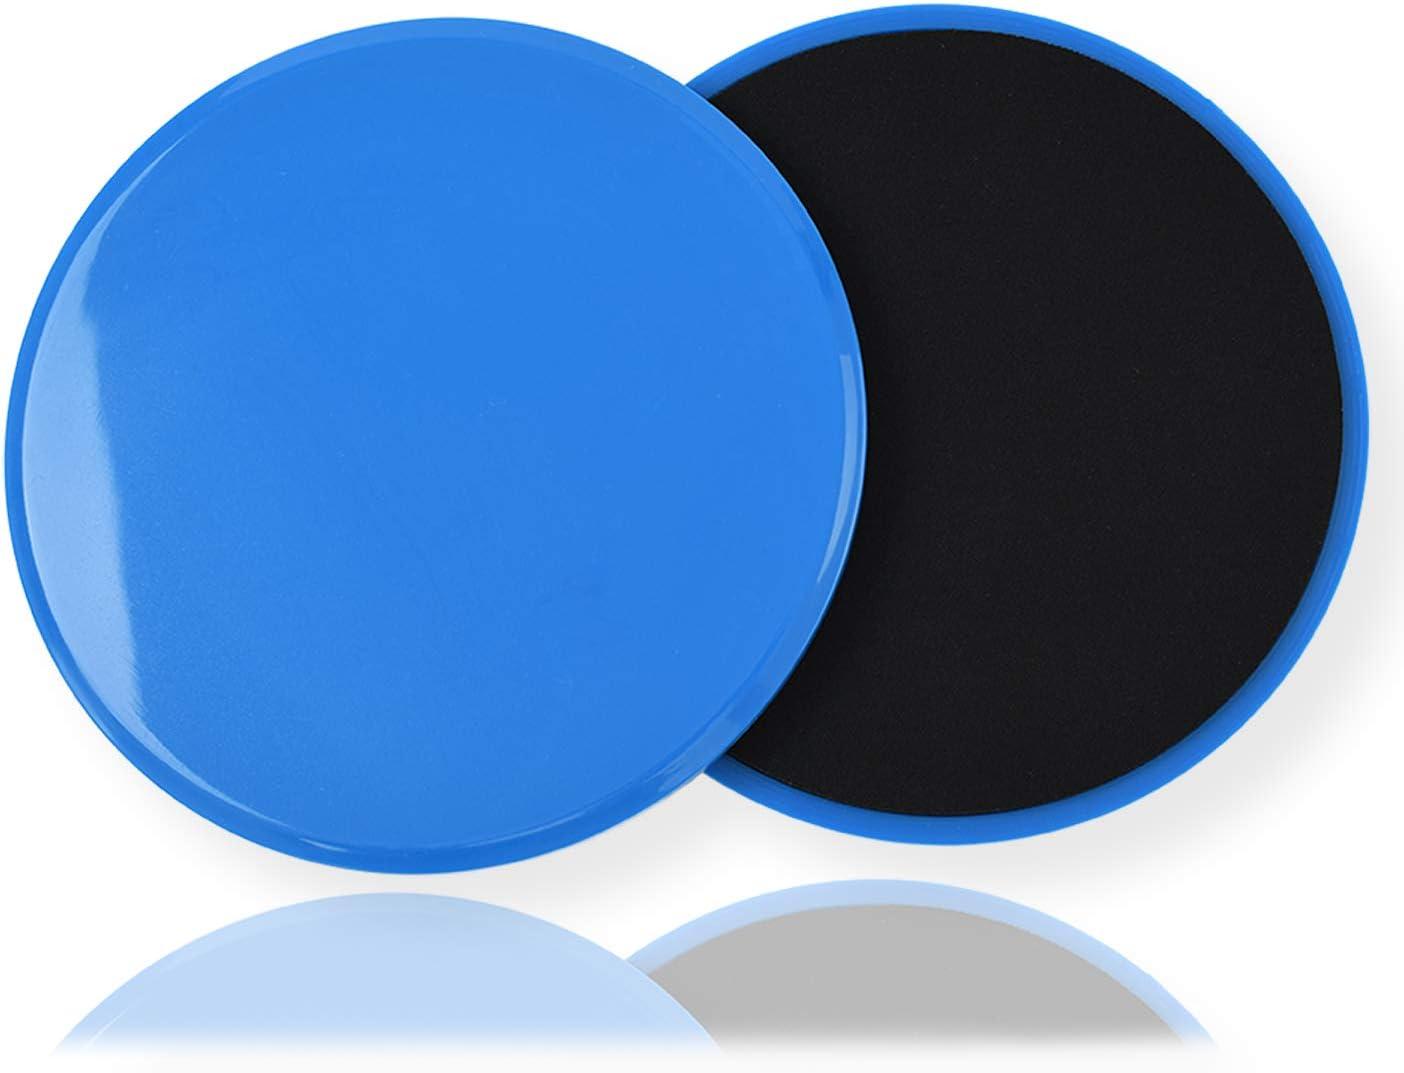 Medimama Core Sliders Workout Equipment Gym Home Workout Exercise Equipment Workout Gear Slider Discs Fitness Sliders Dual Sided Use On Carpet Or Hardwood Floors Abdominal